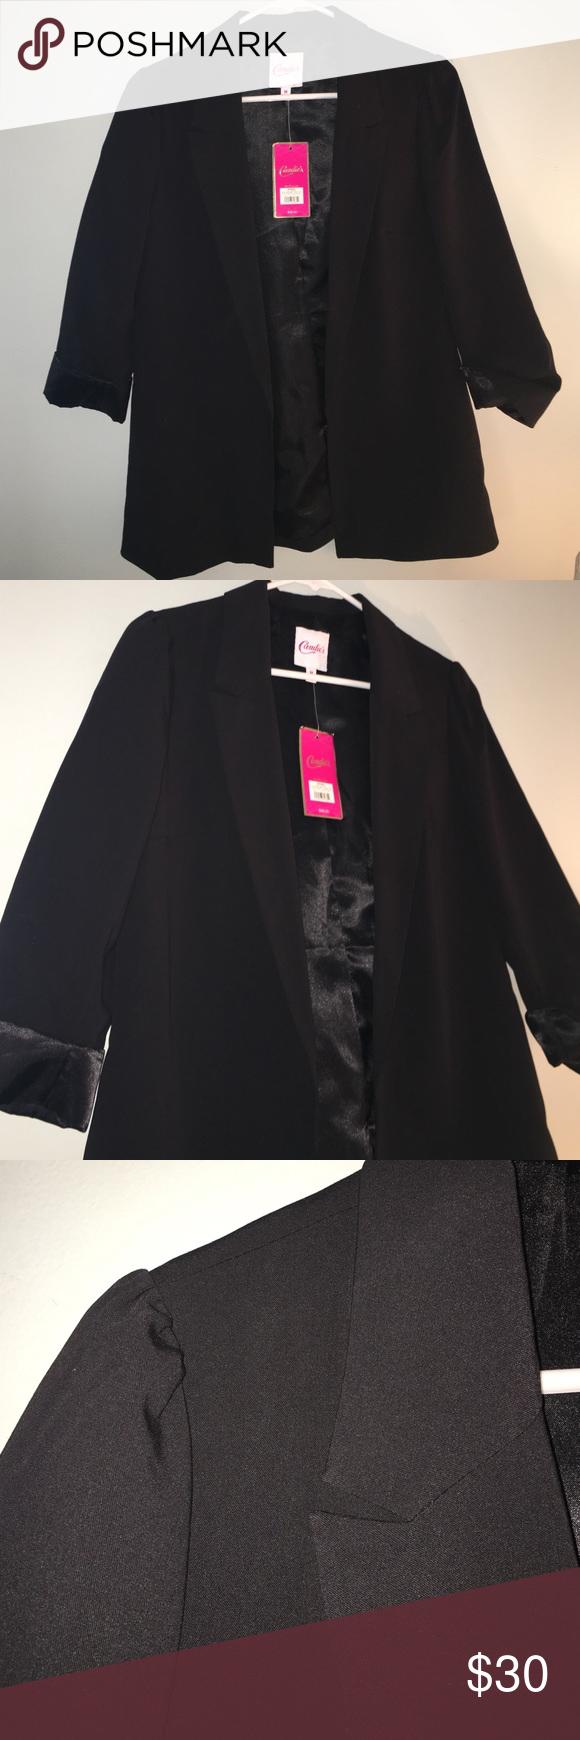 Black Blazer Candies black blazer, three quarter sleeve, small ruffles on the shoulders- New and Never worn Candie's Jackets & Coats Blazers